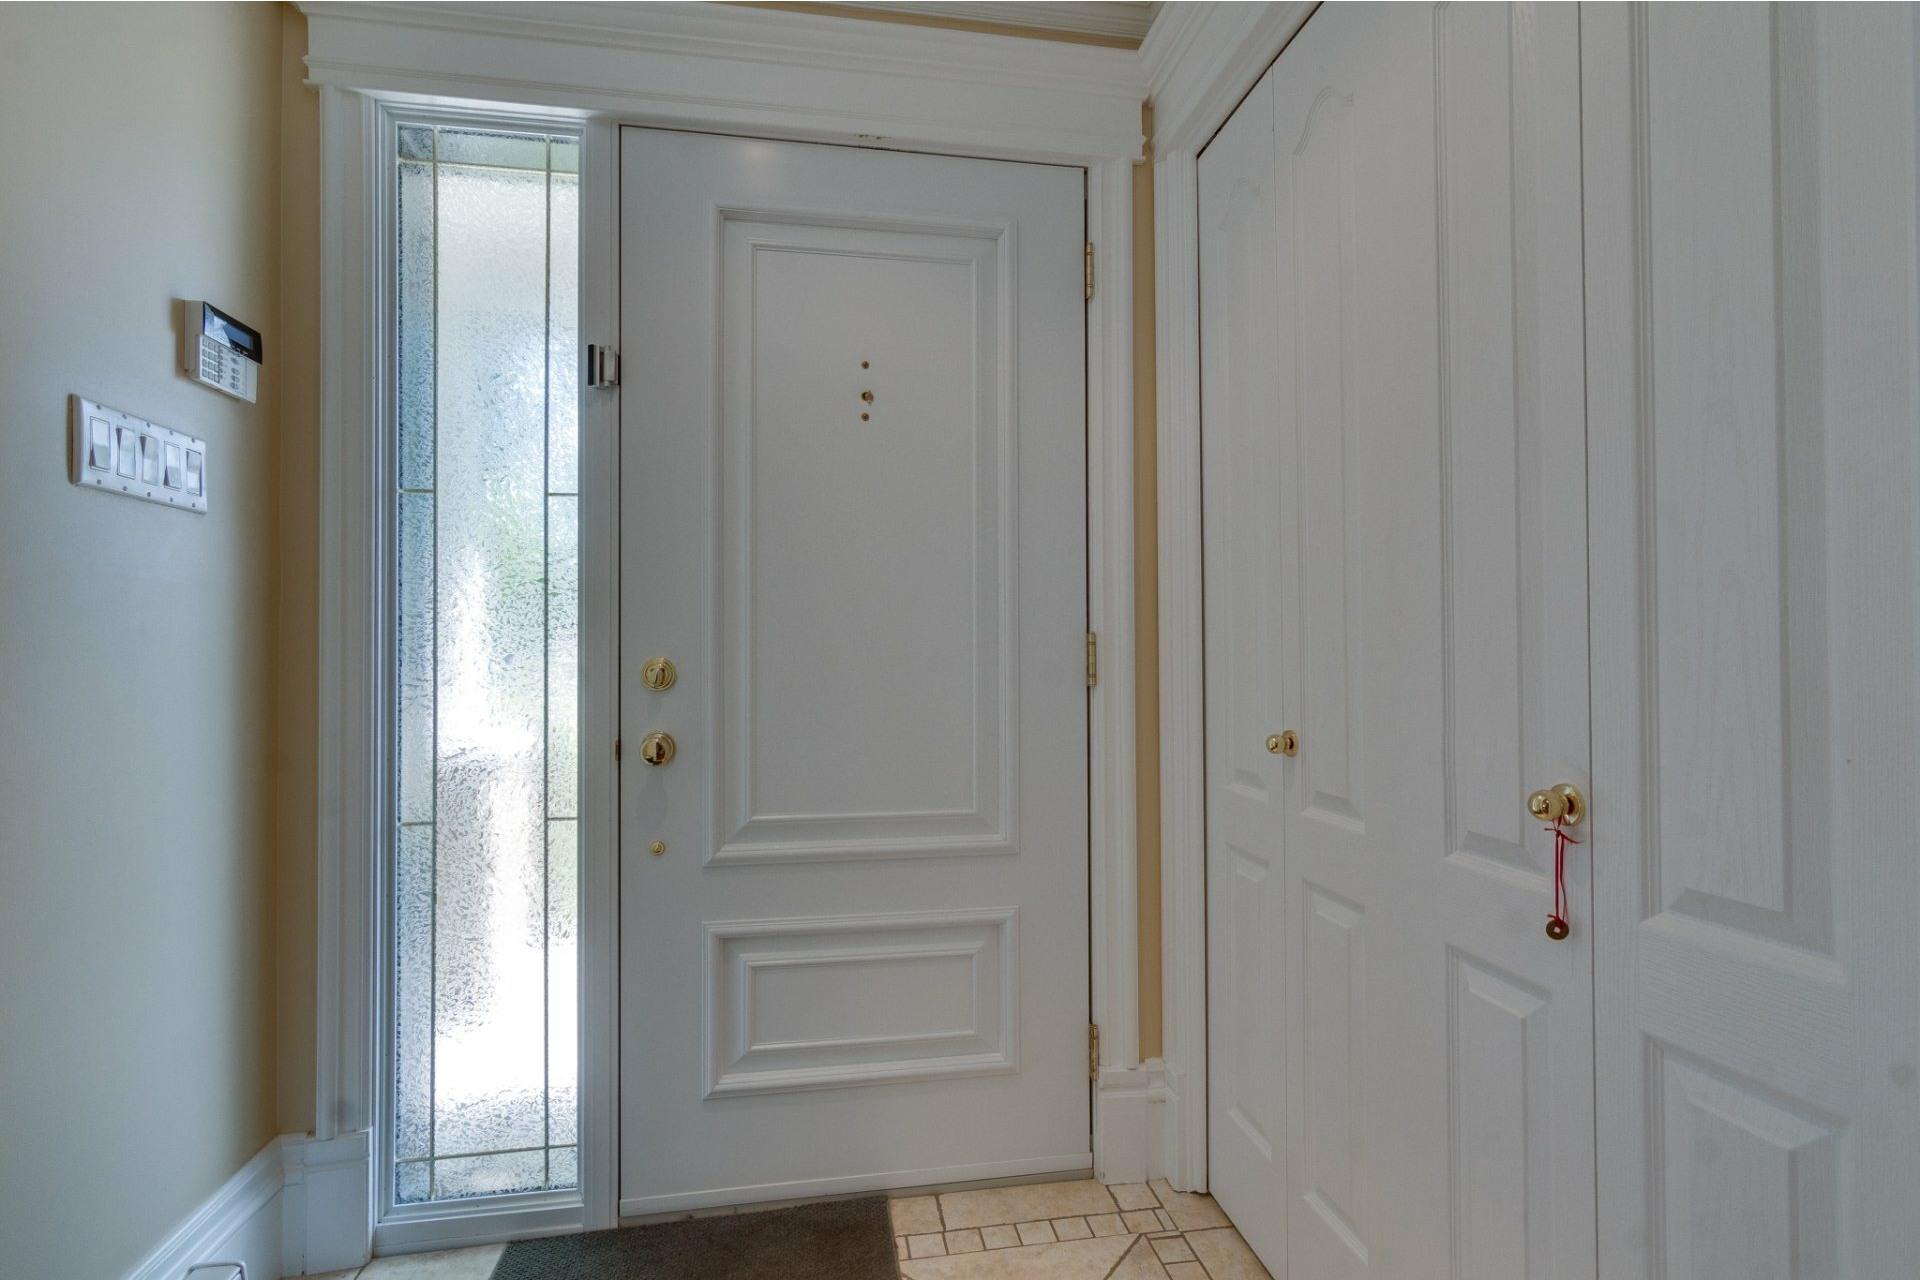 image 32 - Farmhouse For sale Boisbriand - 10 rooms